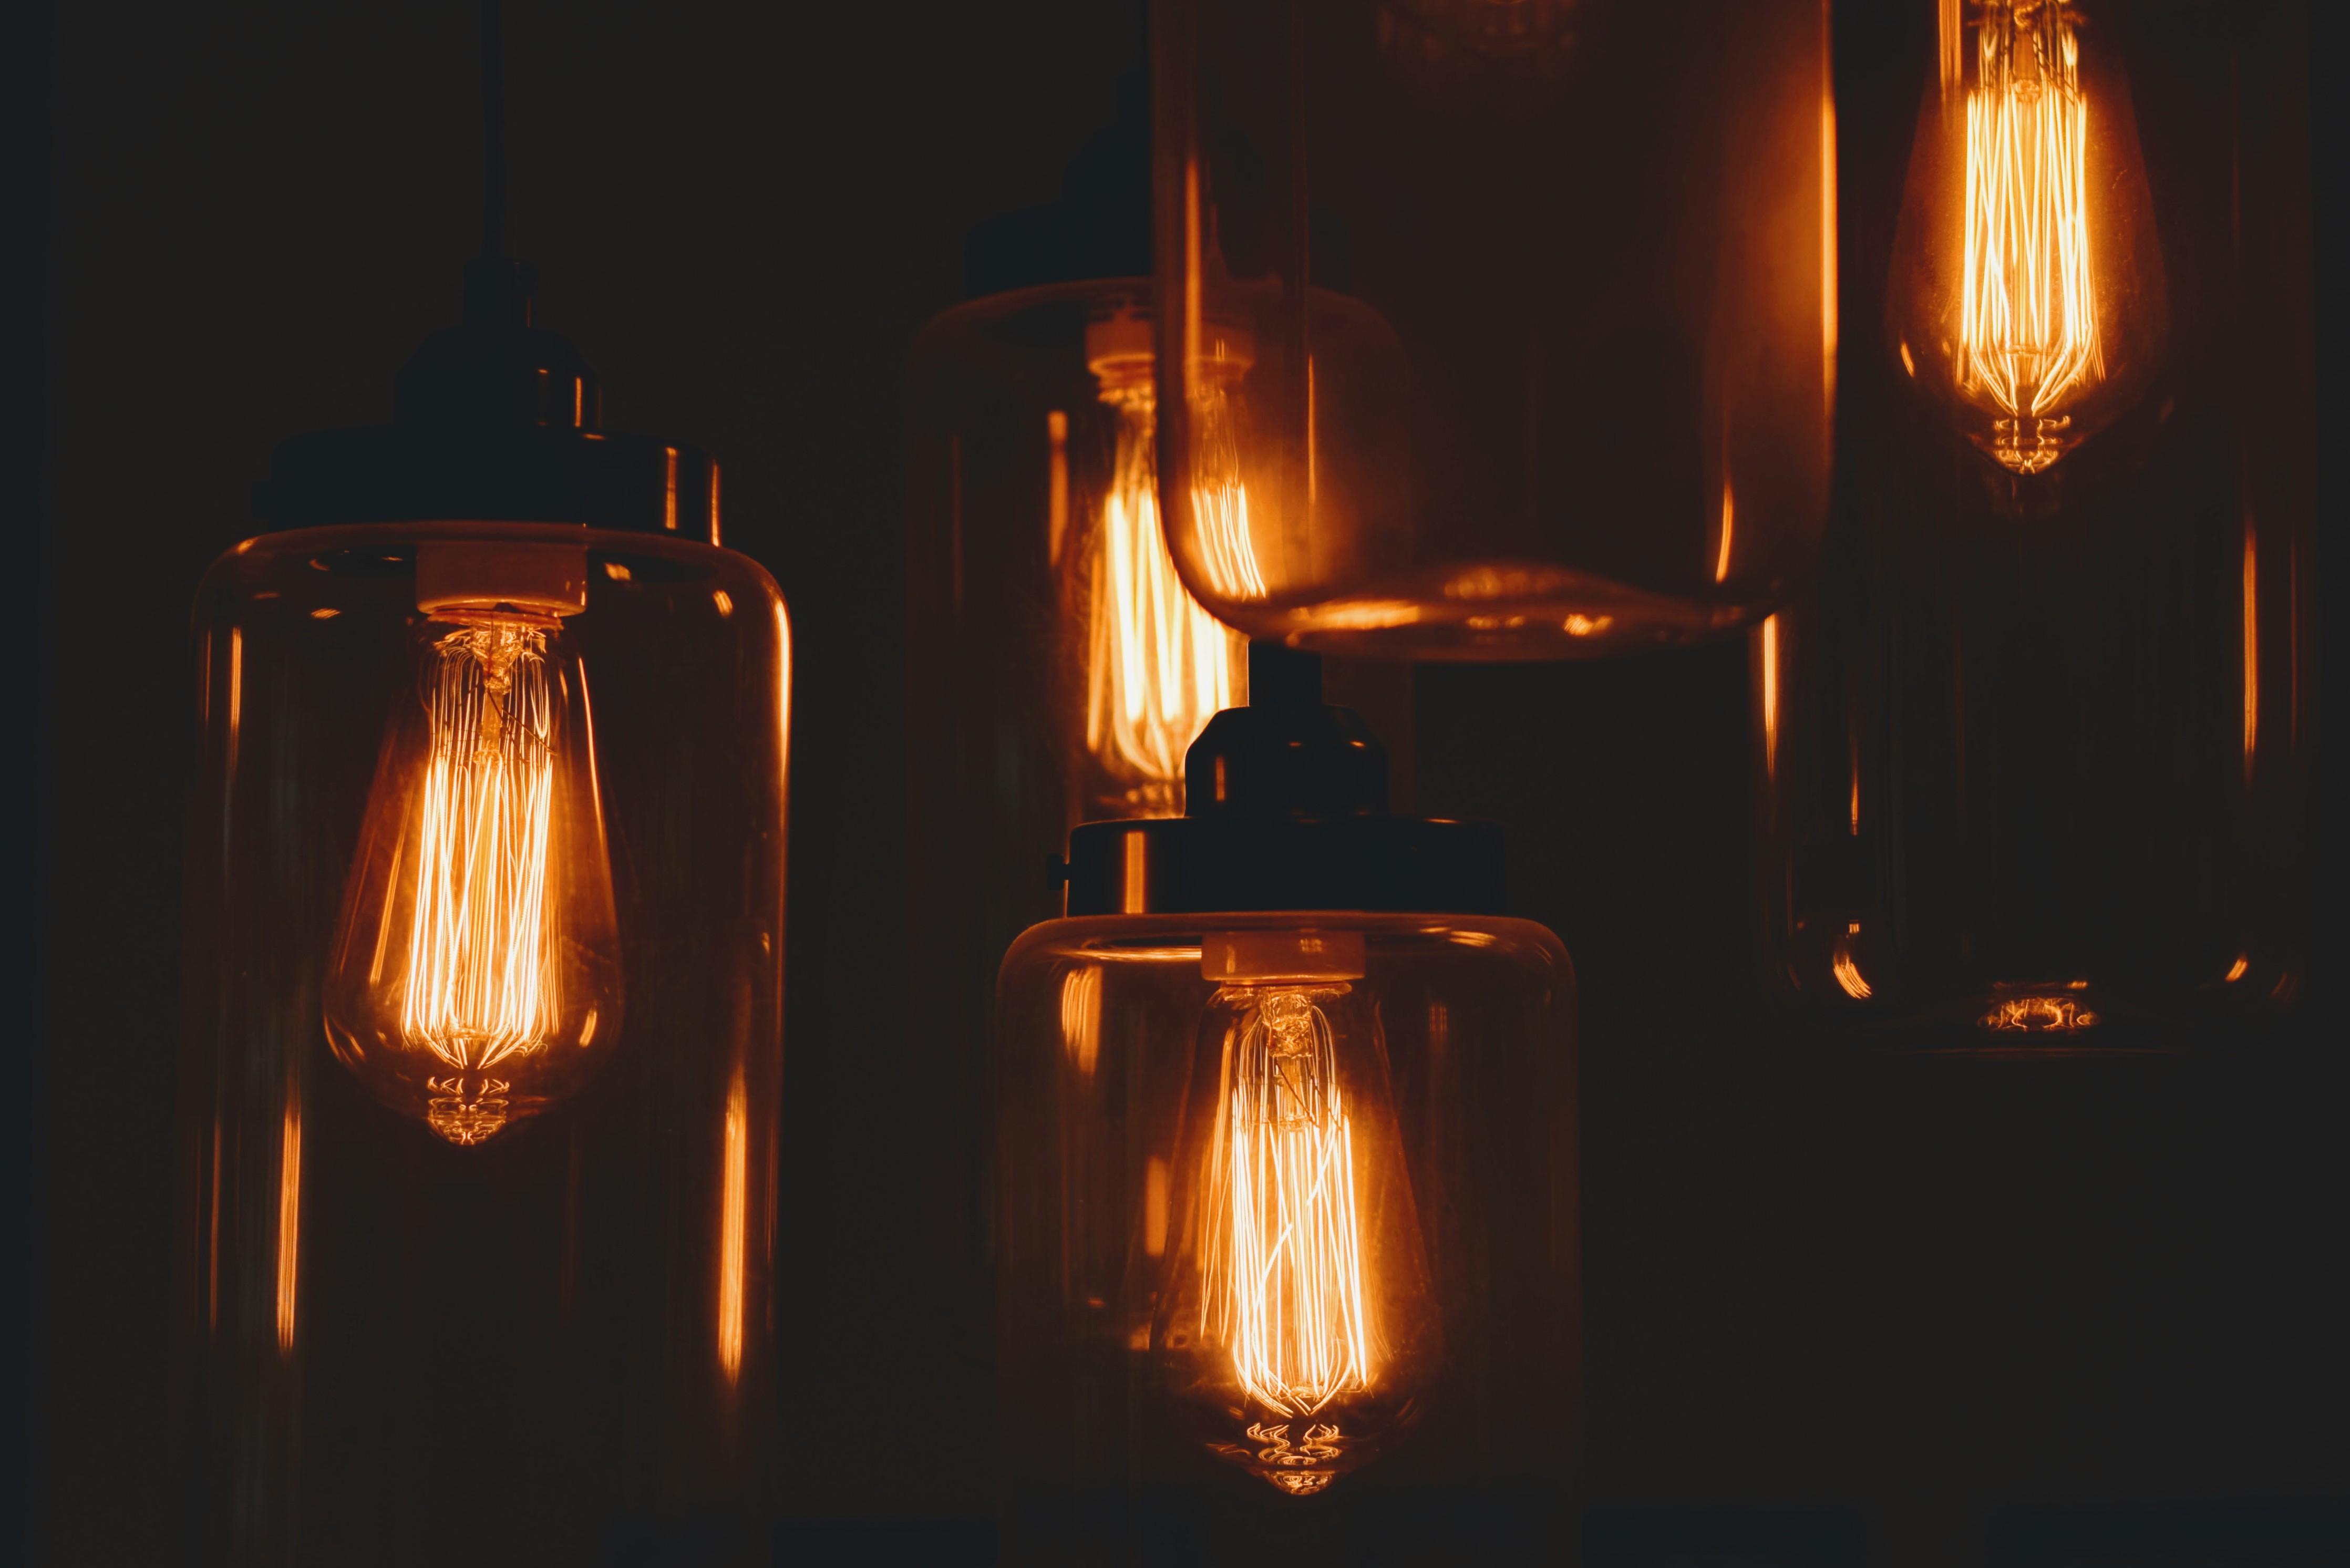 Free Images   Dark  Lantern  Flame  Fire  Glow  Darkness